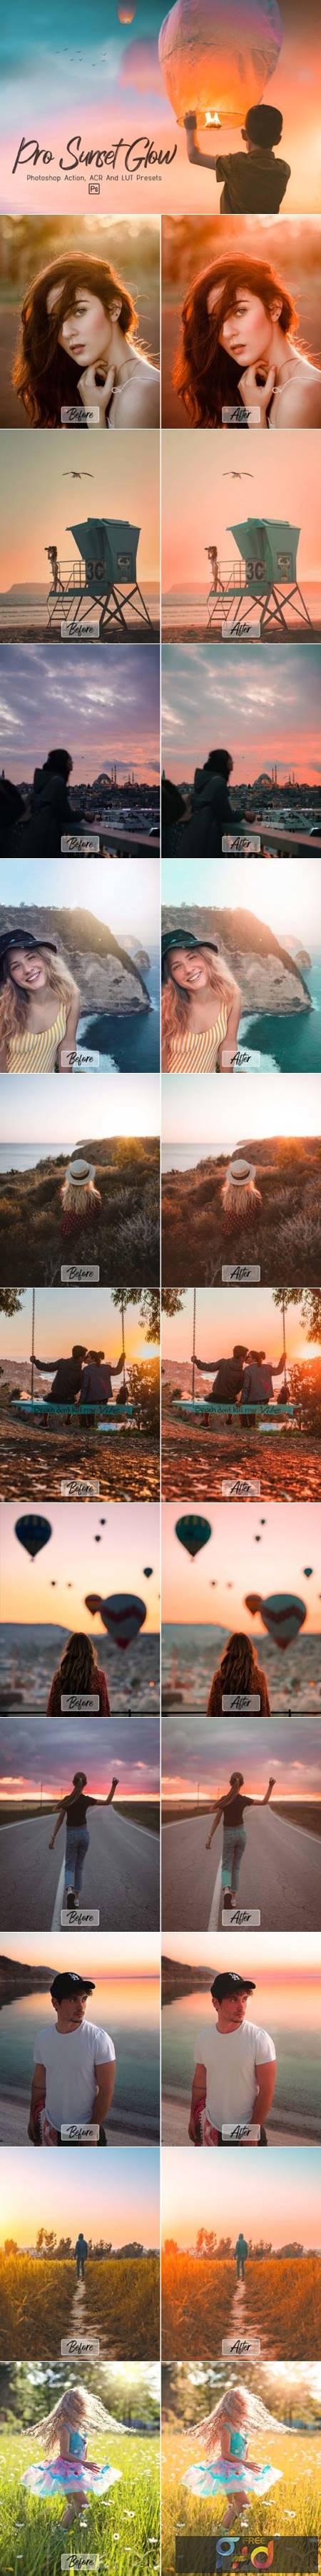 Pro Sunset Glow Photoshop Actions 9203812 1